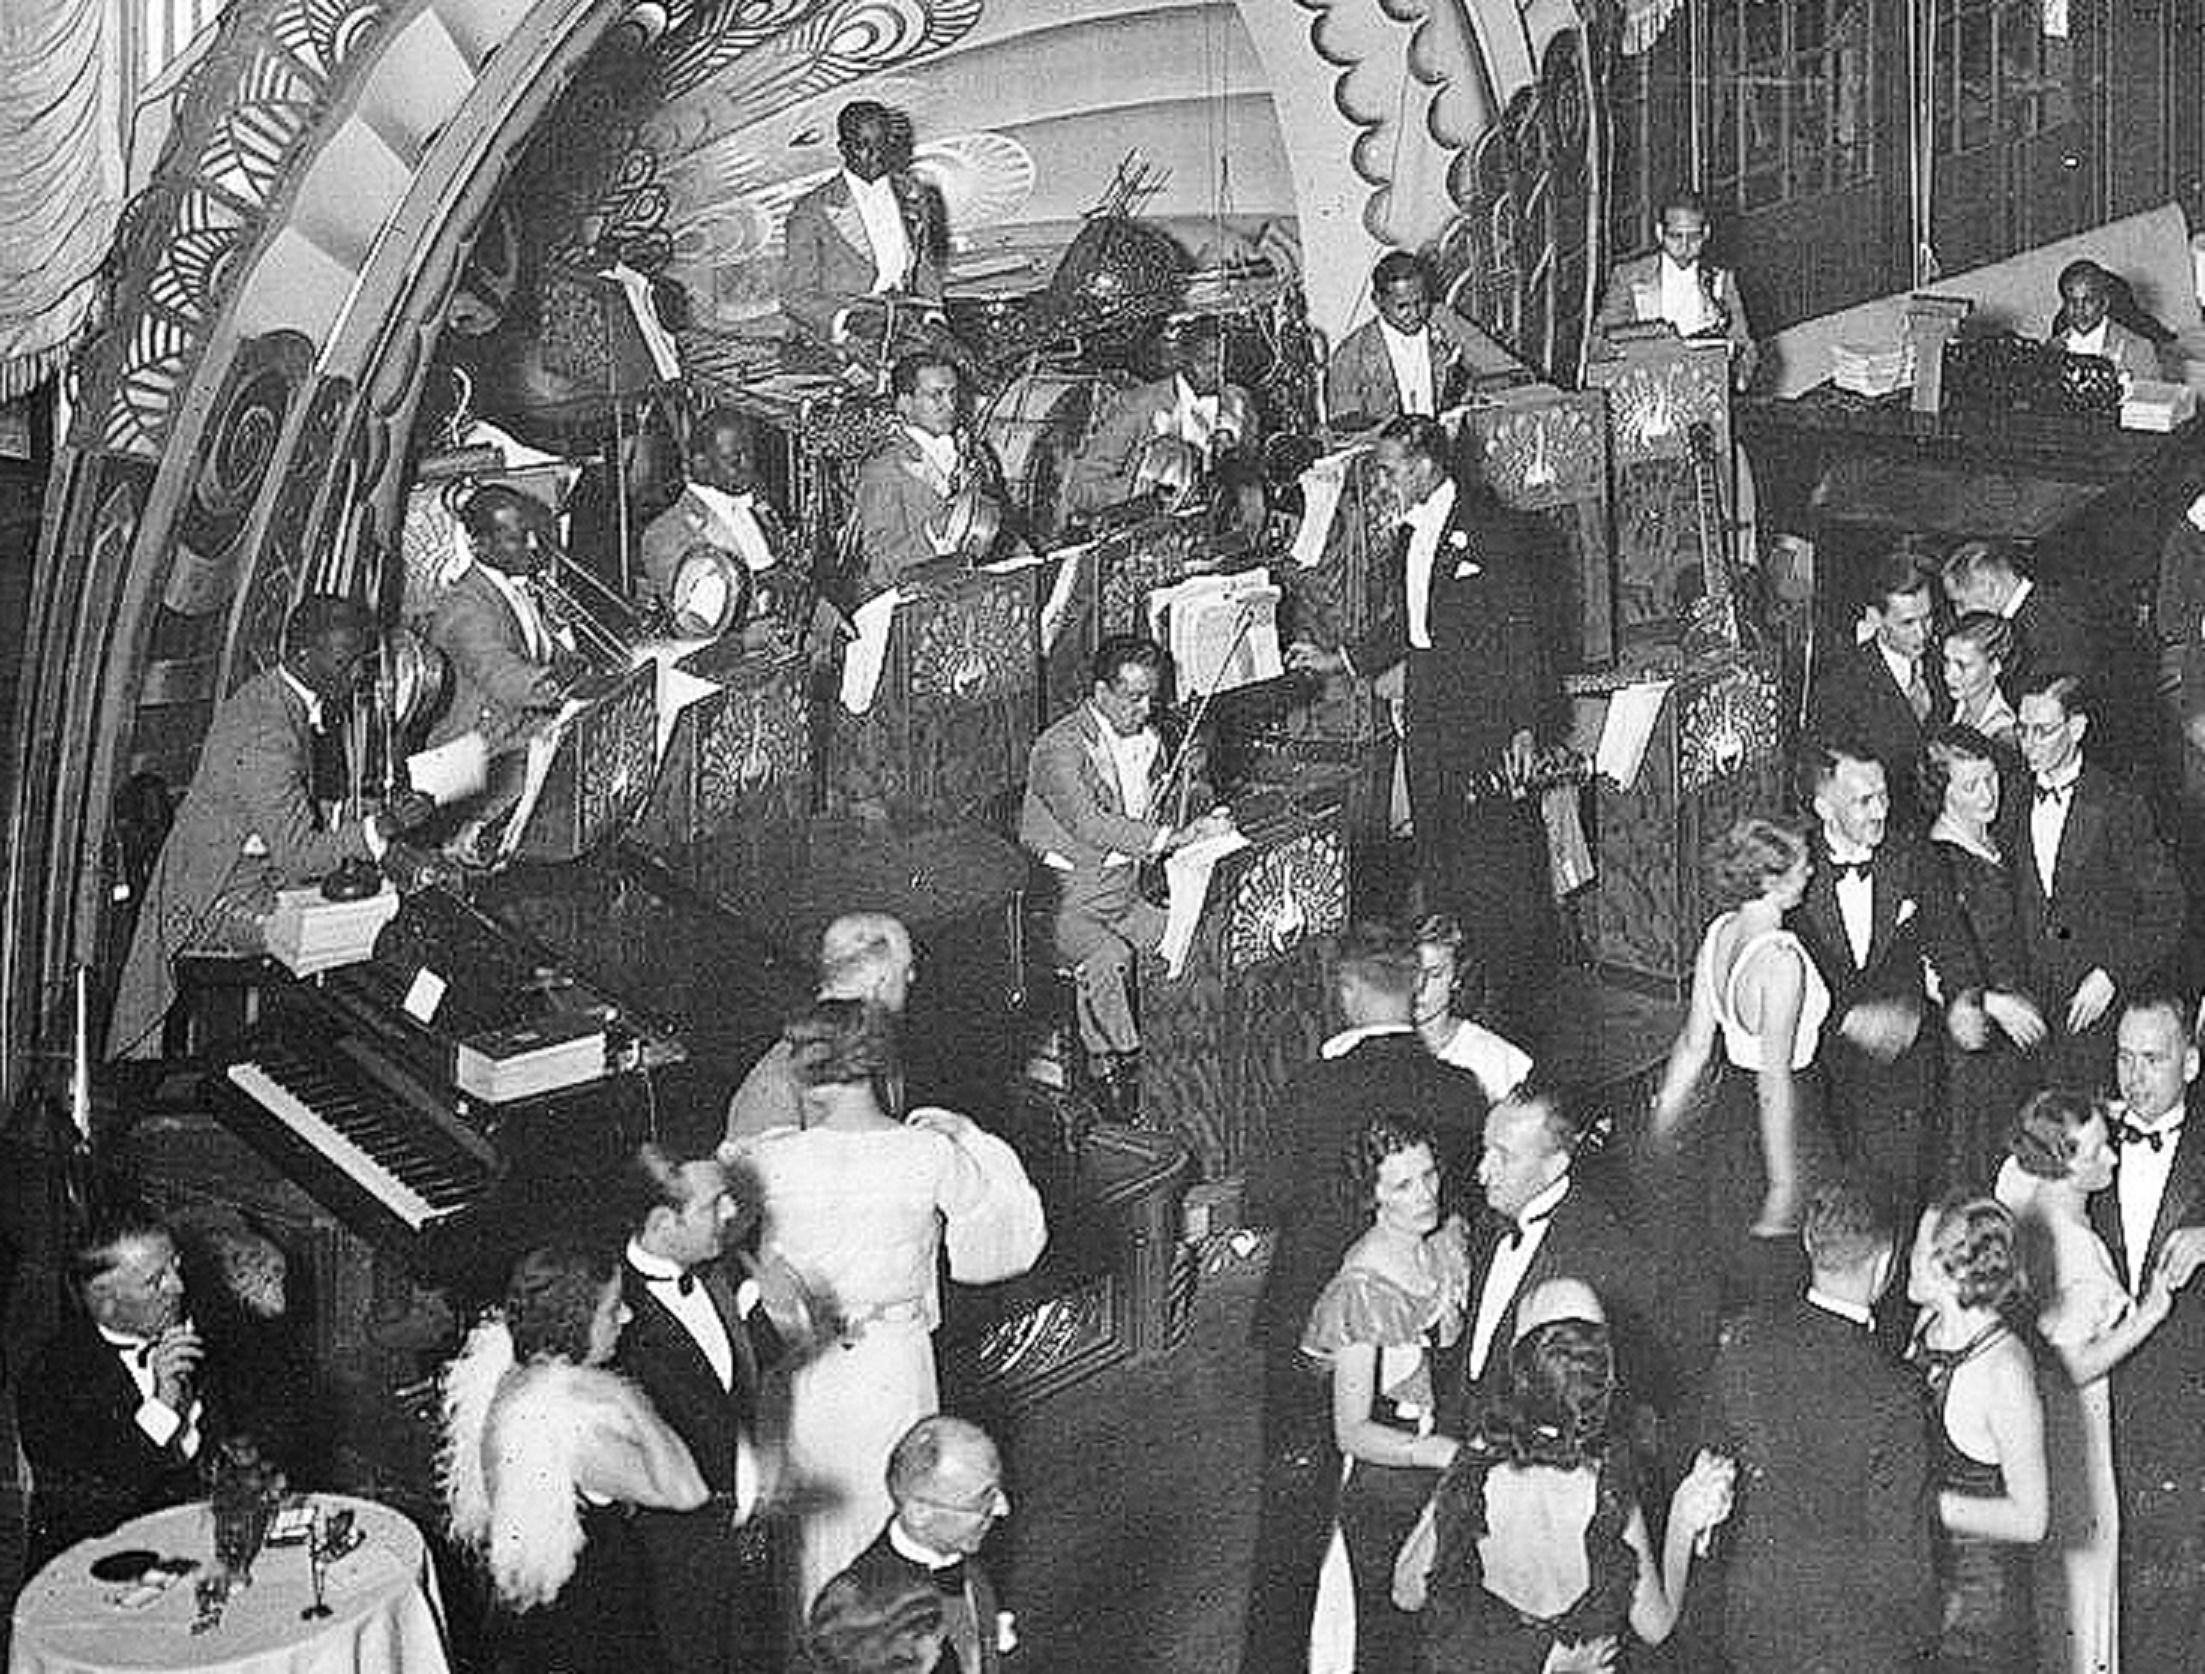 Dancing to Buck Clayton Shanghai Canidrome 1934